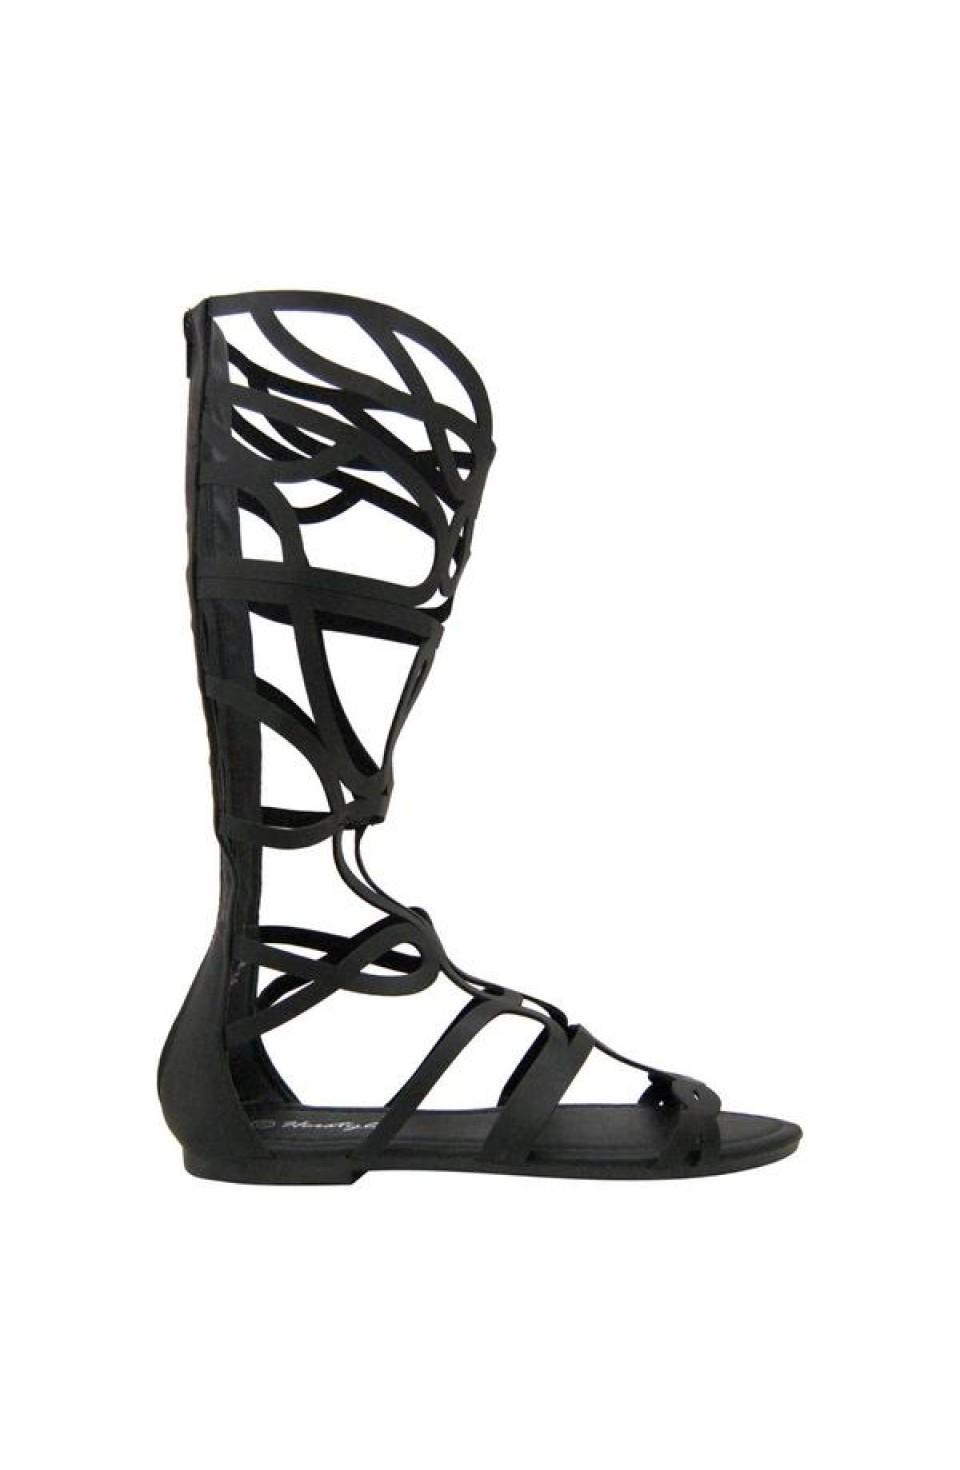 Women's Black Manmade Skravee Tall Gladiator Sandal with Curvy Straps